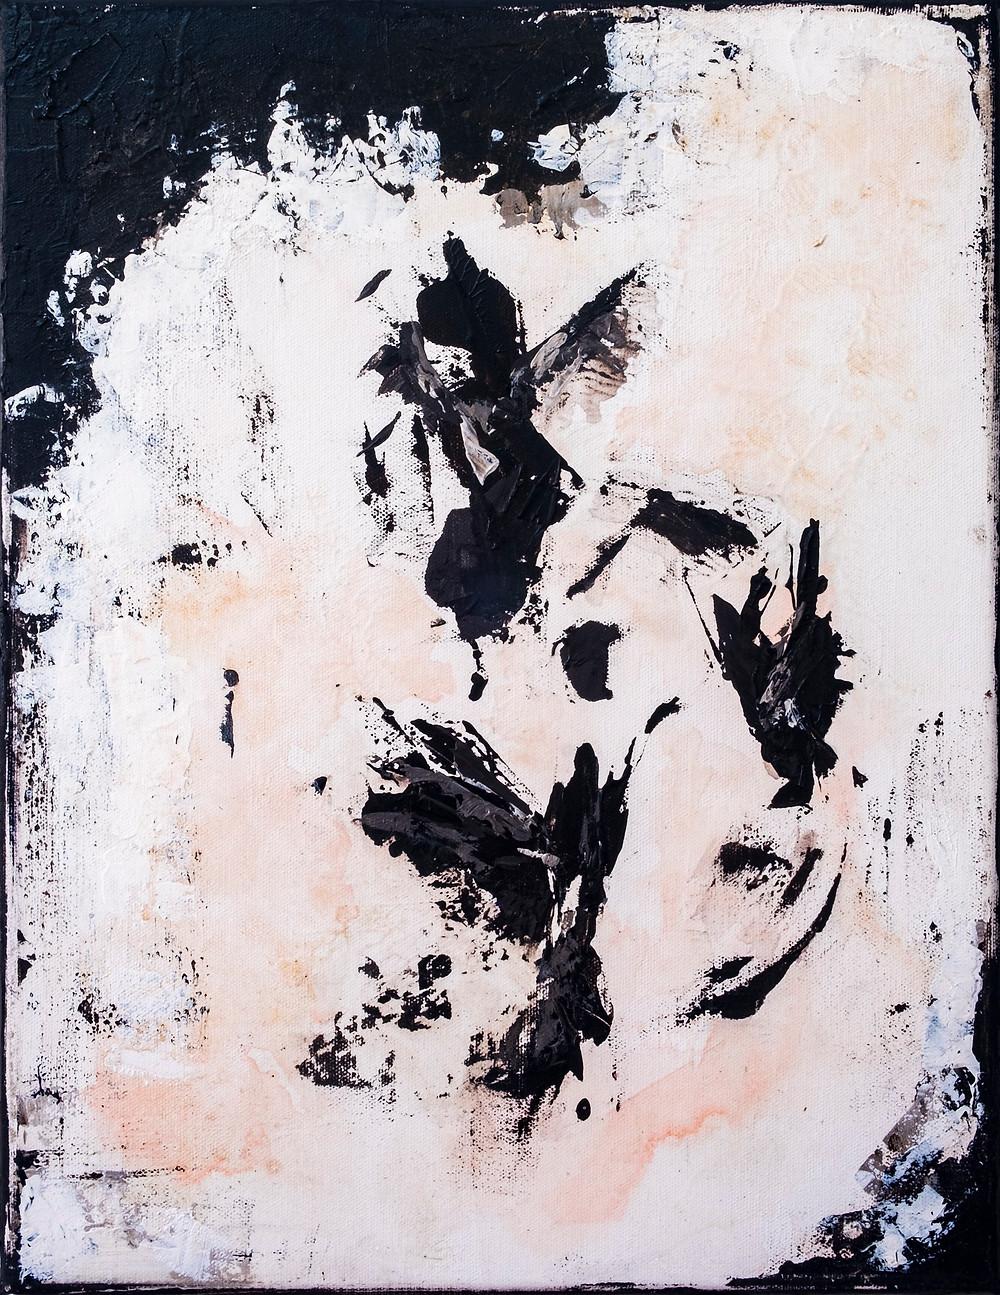 Art Herald Magazine, The Collector's Award, Studio-ID Art Gallery, Global Art Competition, Nidhi Samani, Deborah Henry-Pollard, Joan Marie Kelly, Gerald Tay, Clara Lim